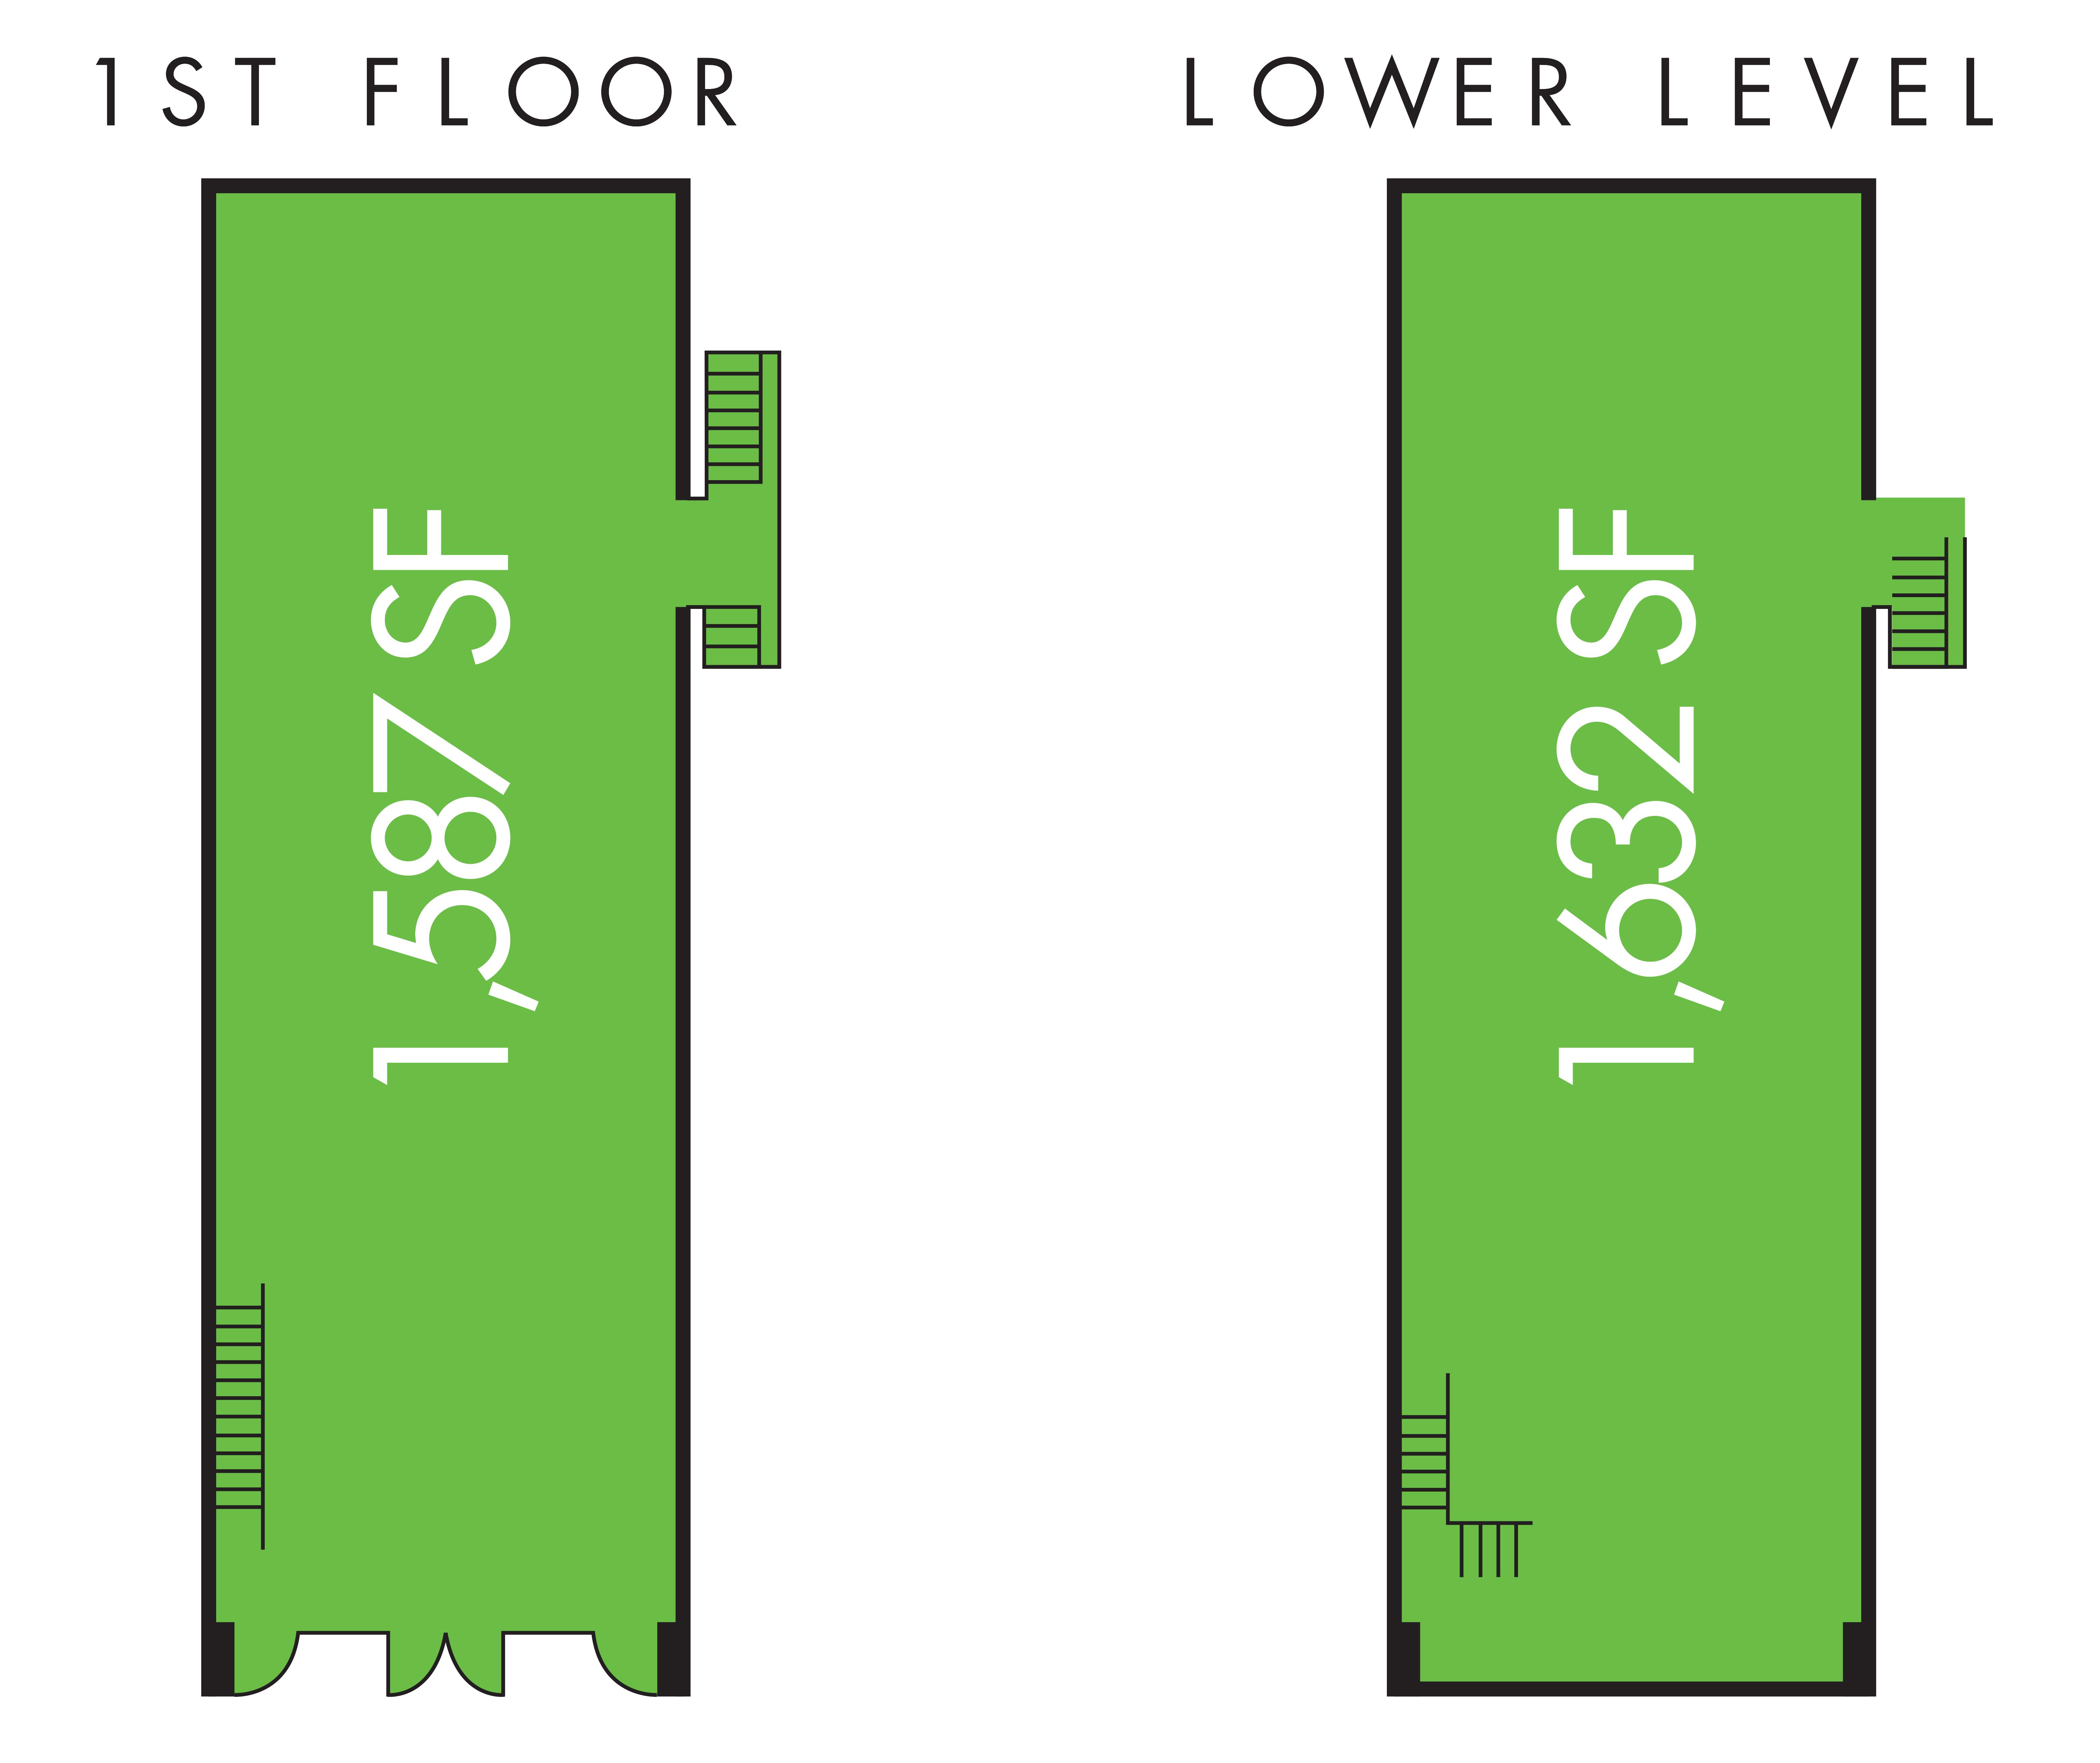 2101 K Street NW: site plan